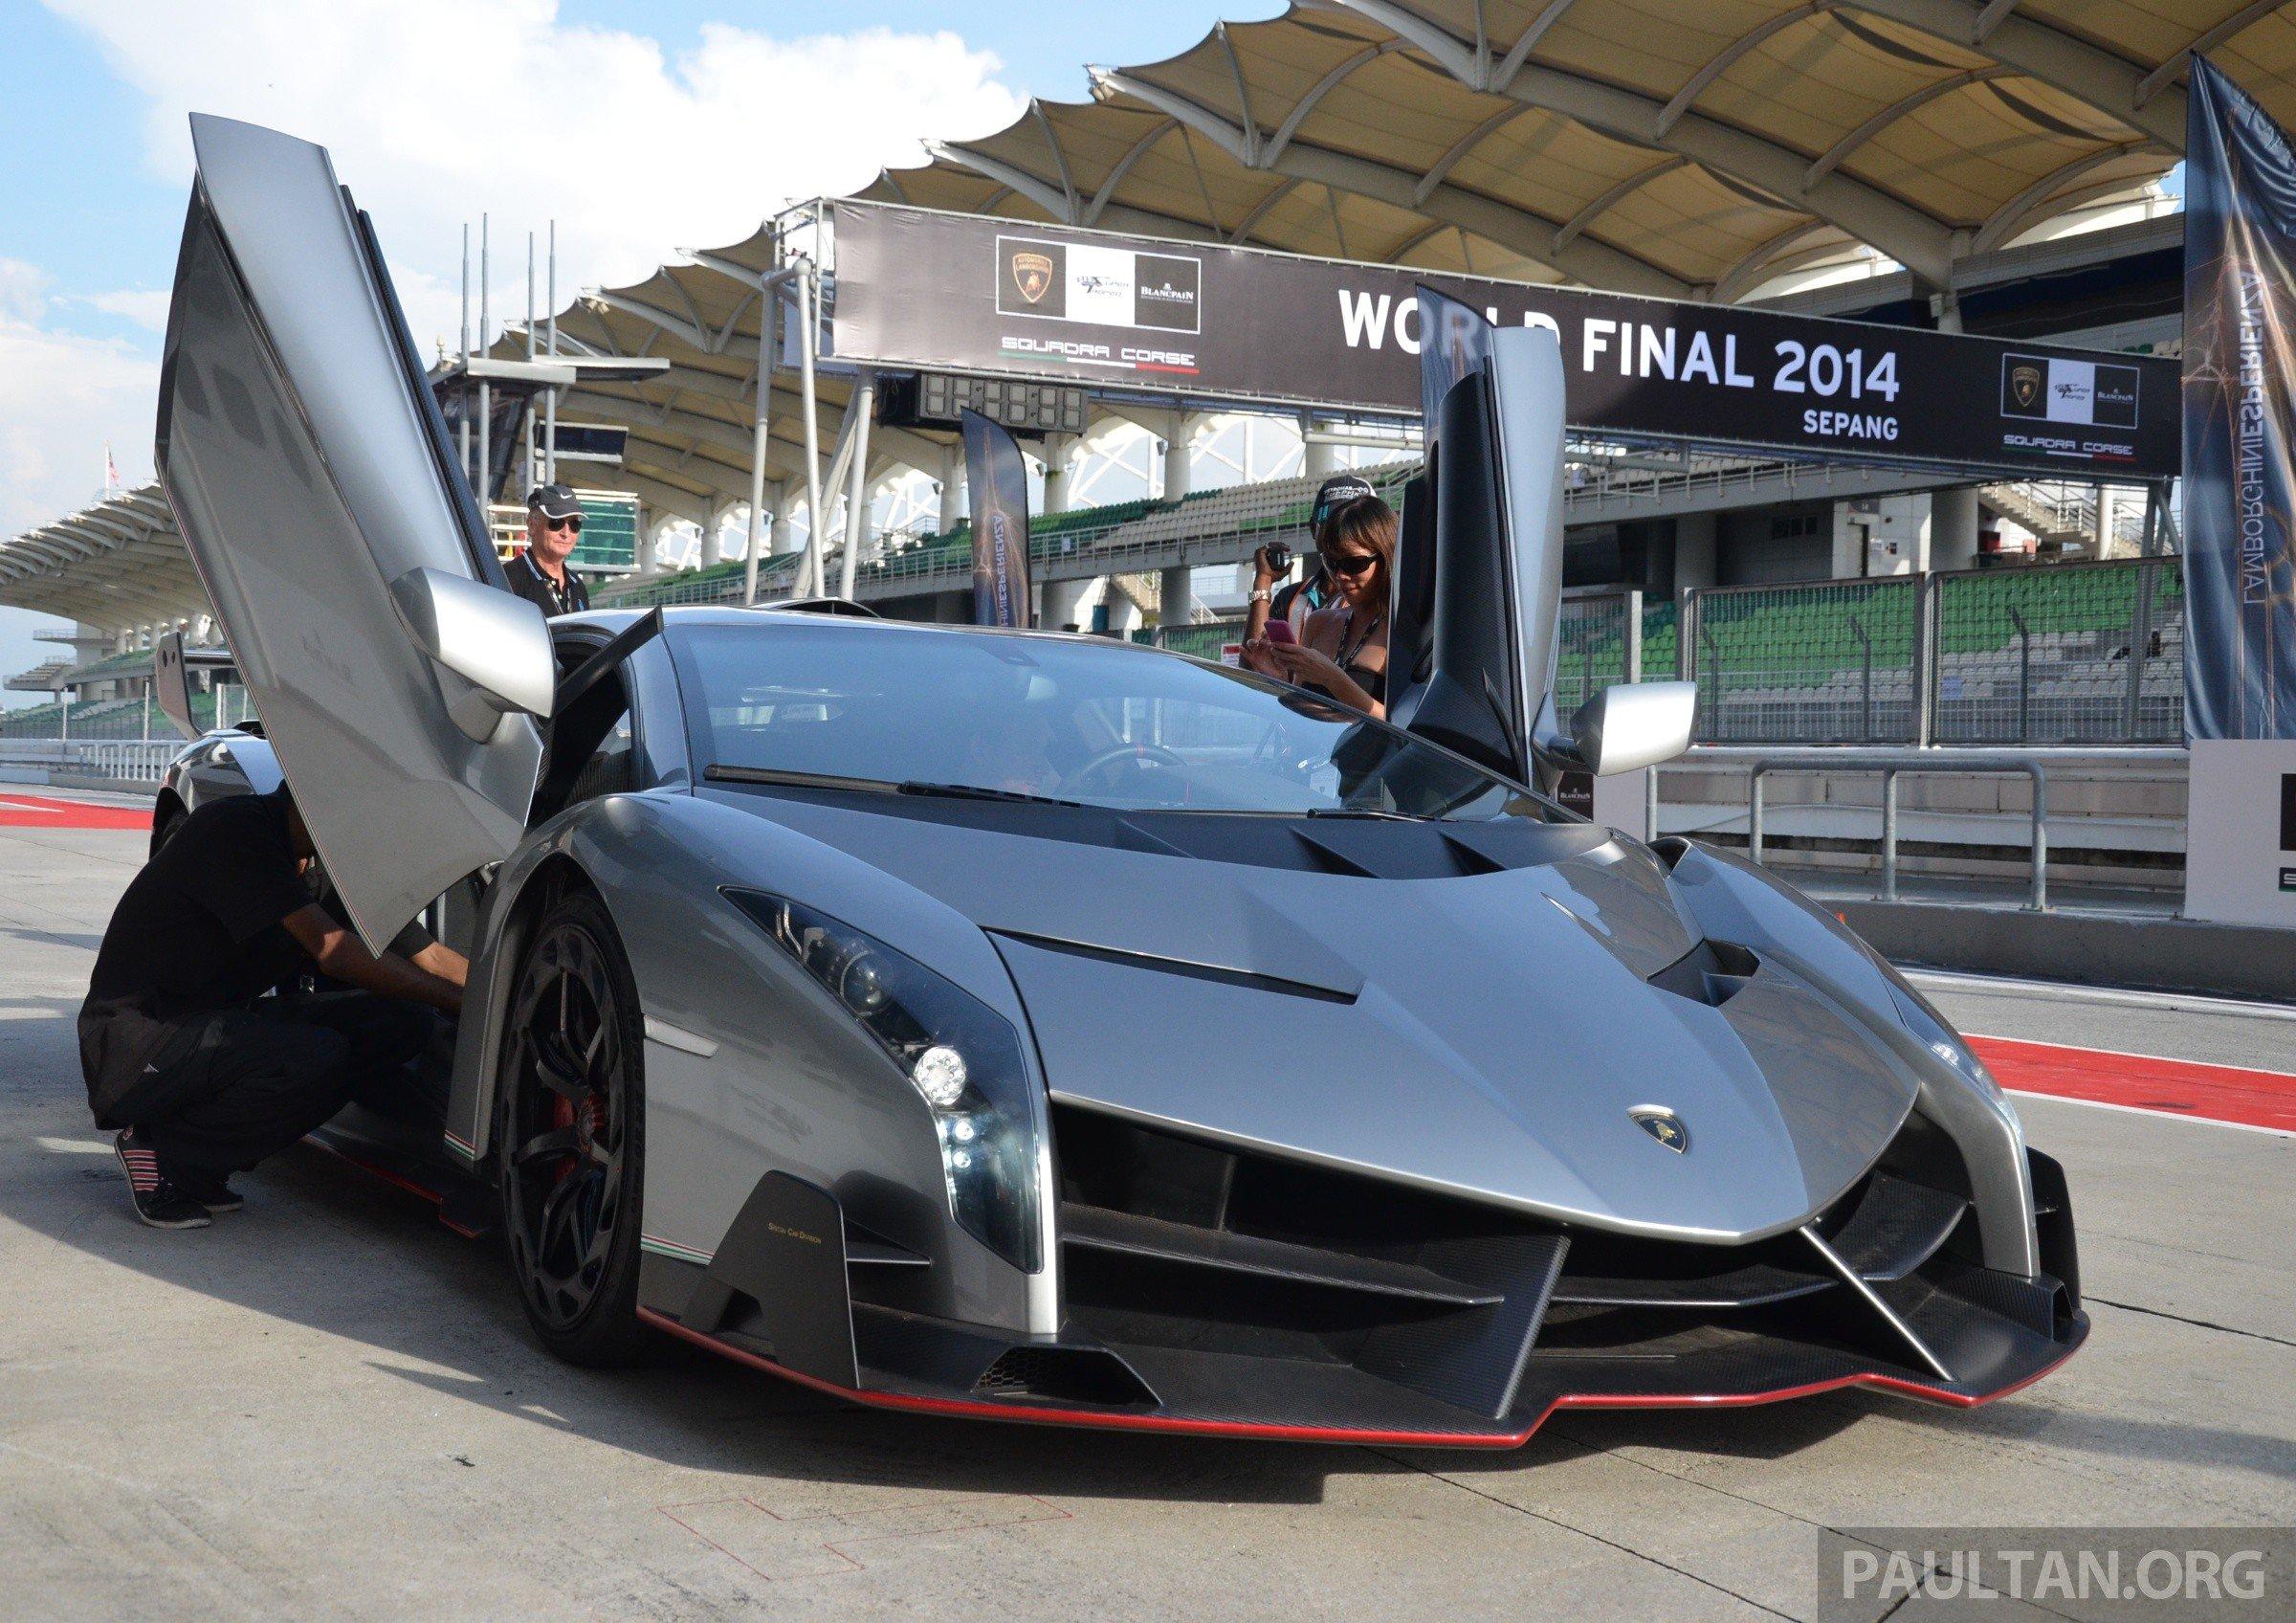 Lamborghini Veneno Makes An Appearance At Sepang